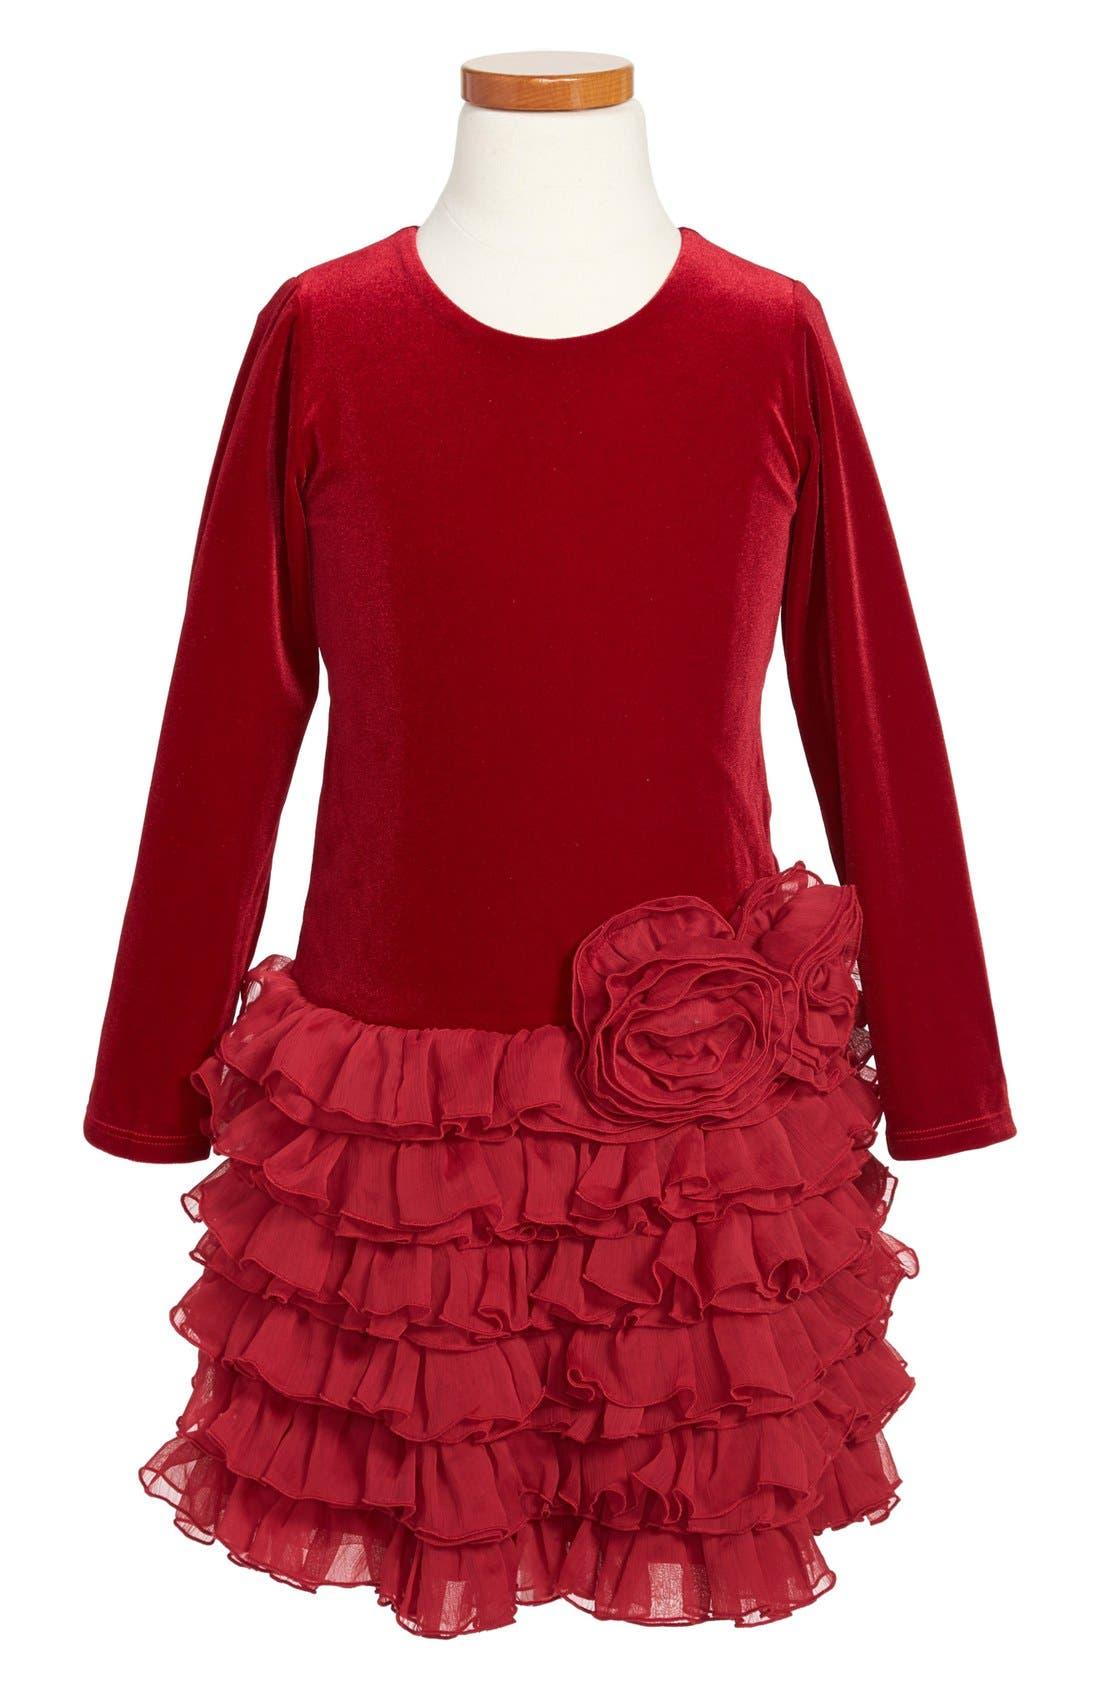 Main Image - Isobella & Chloe Drop Waist Ruffle Dress (Little Girls & Big Girls)